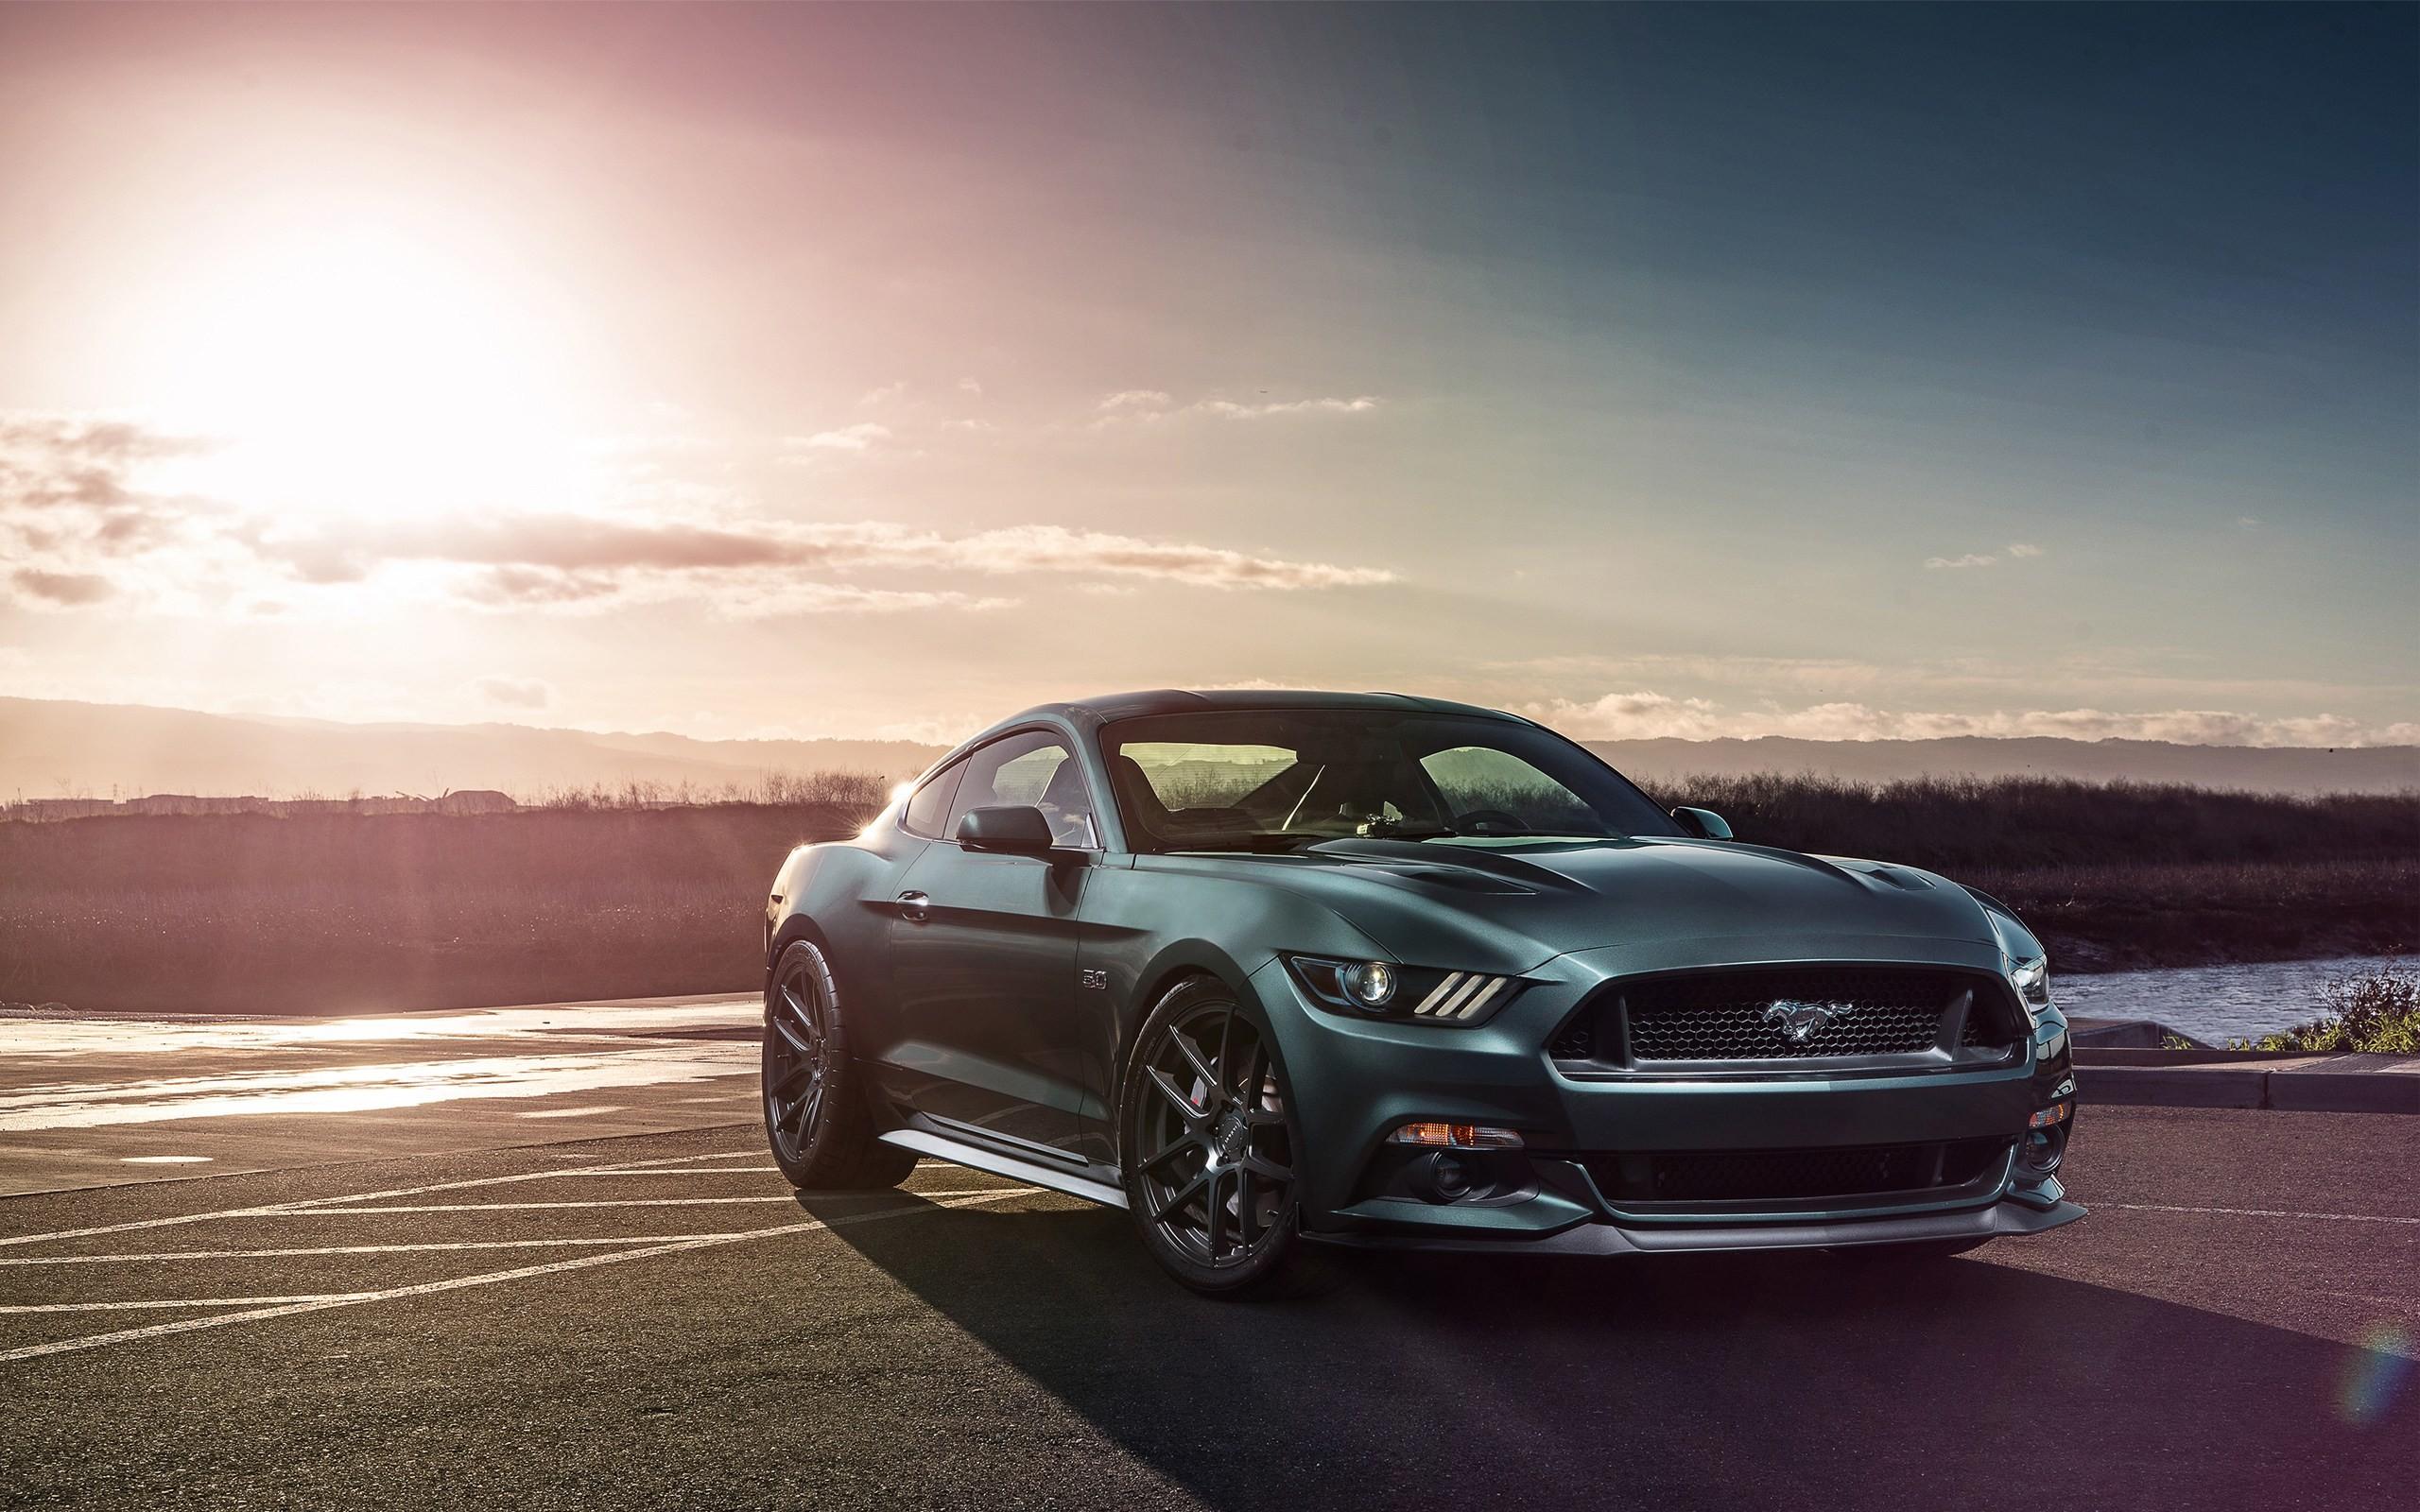 2018 Mustang Gt Wallpaper Wallpapertag